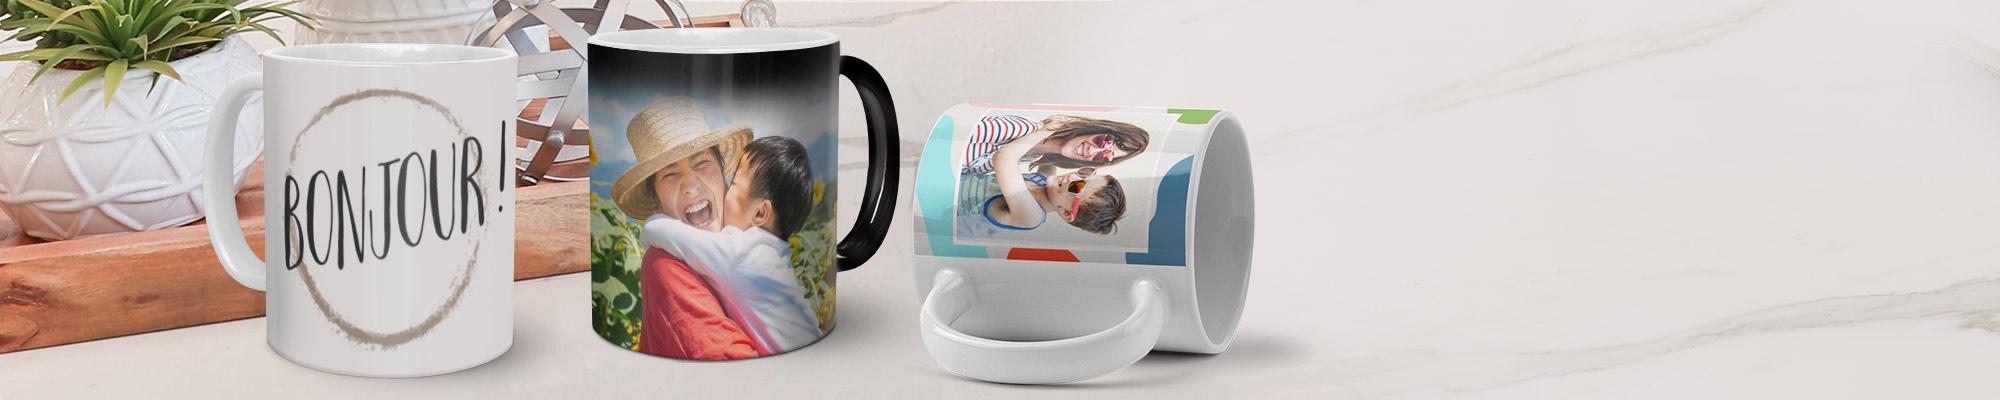 mugs personnalise